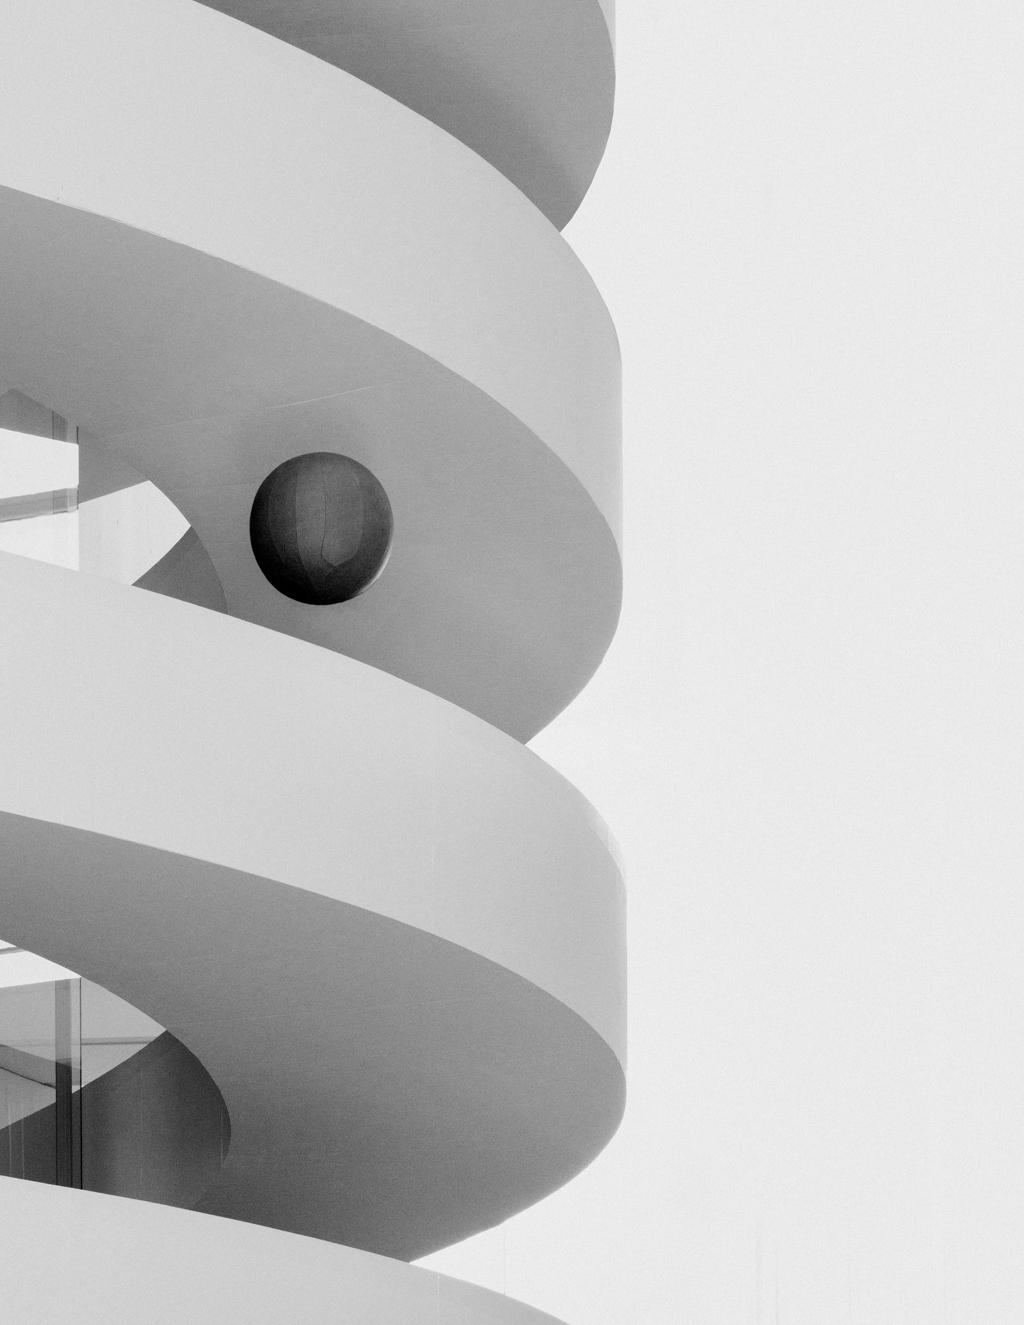 JonasBjerrePoulsen_HumanSpheres_III_Architectura_Web_1024x1325px